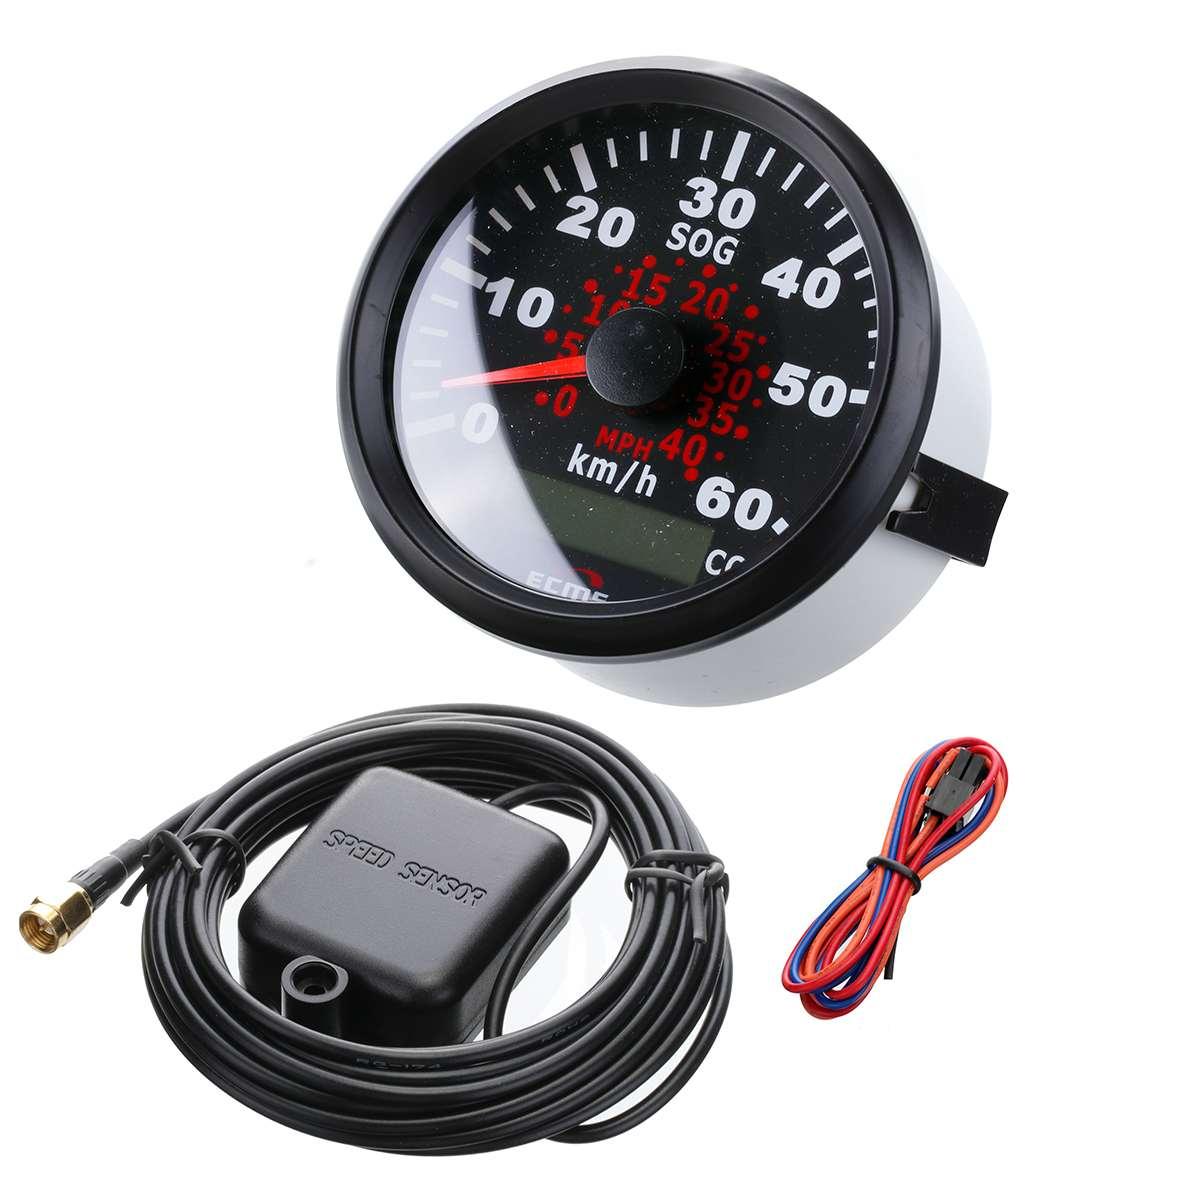 85mm Auto Car Truck Marine GPS Speedometer Waterproof Speed Sensor Meter Gauge Digital Odometer Automobiles Replacement Parts 12